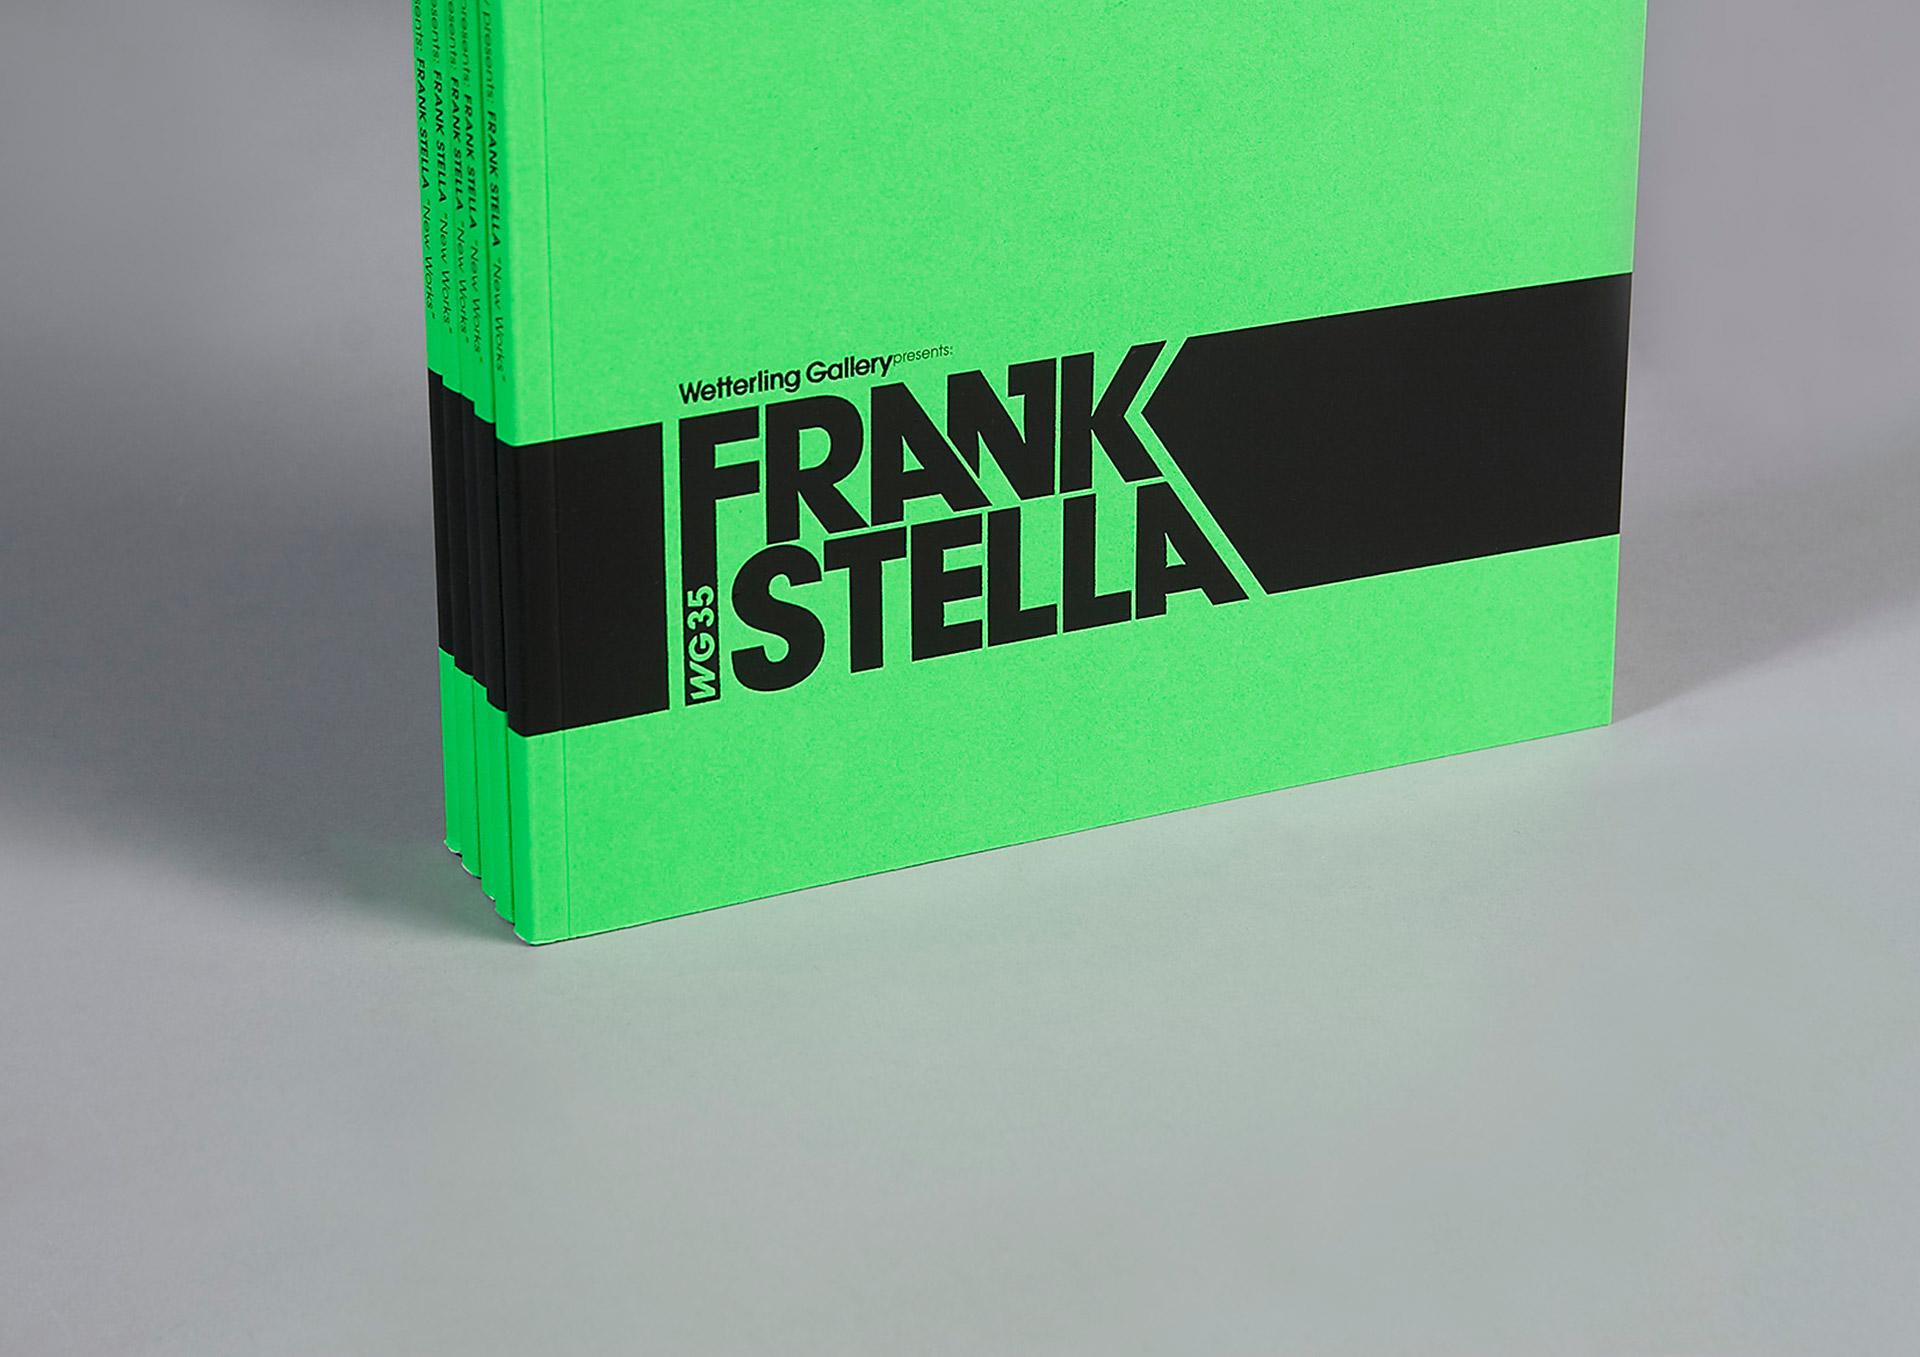 WG_Frank_Stella_6_Case_Image_1920x1357